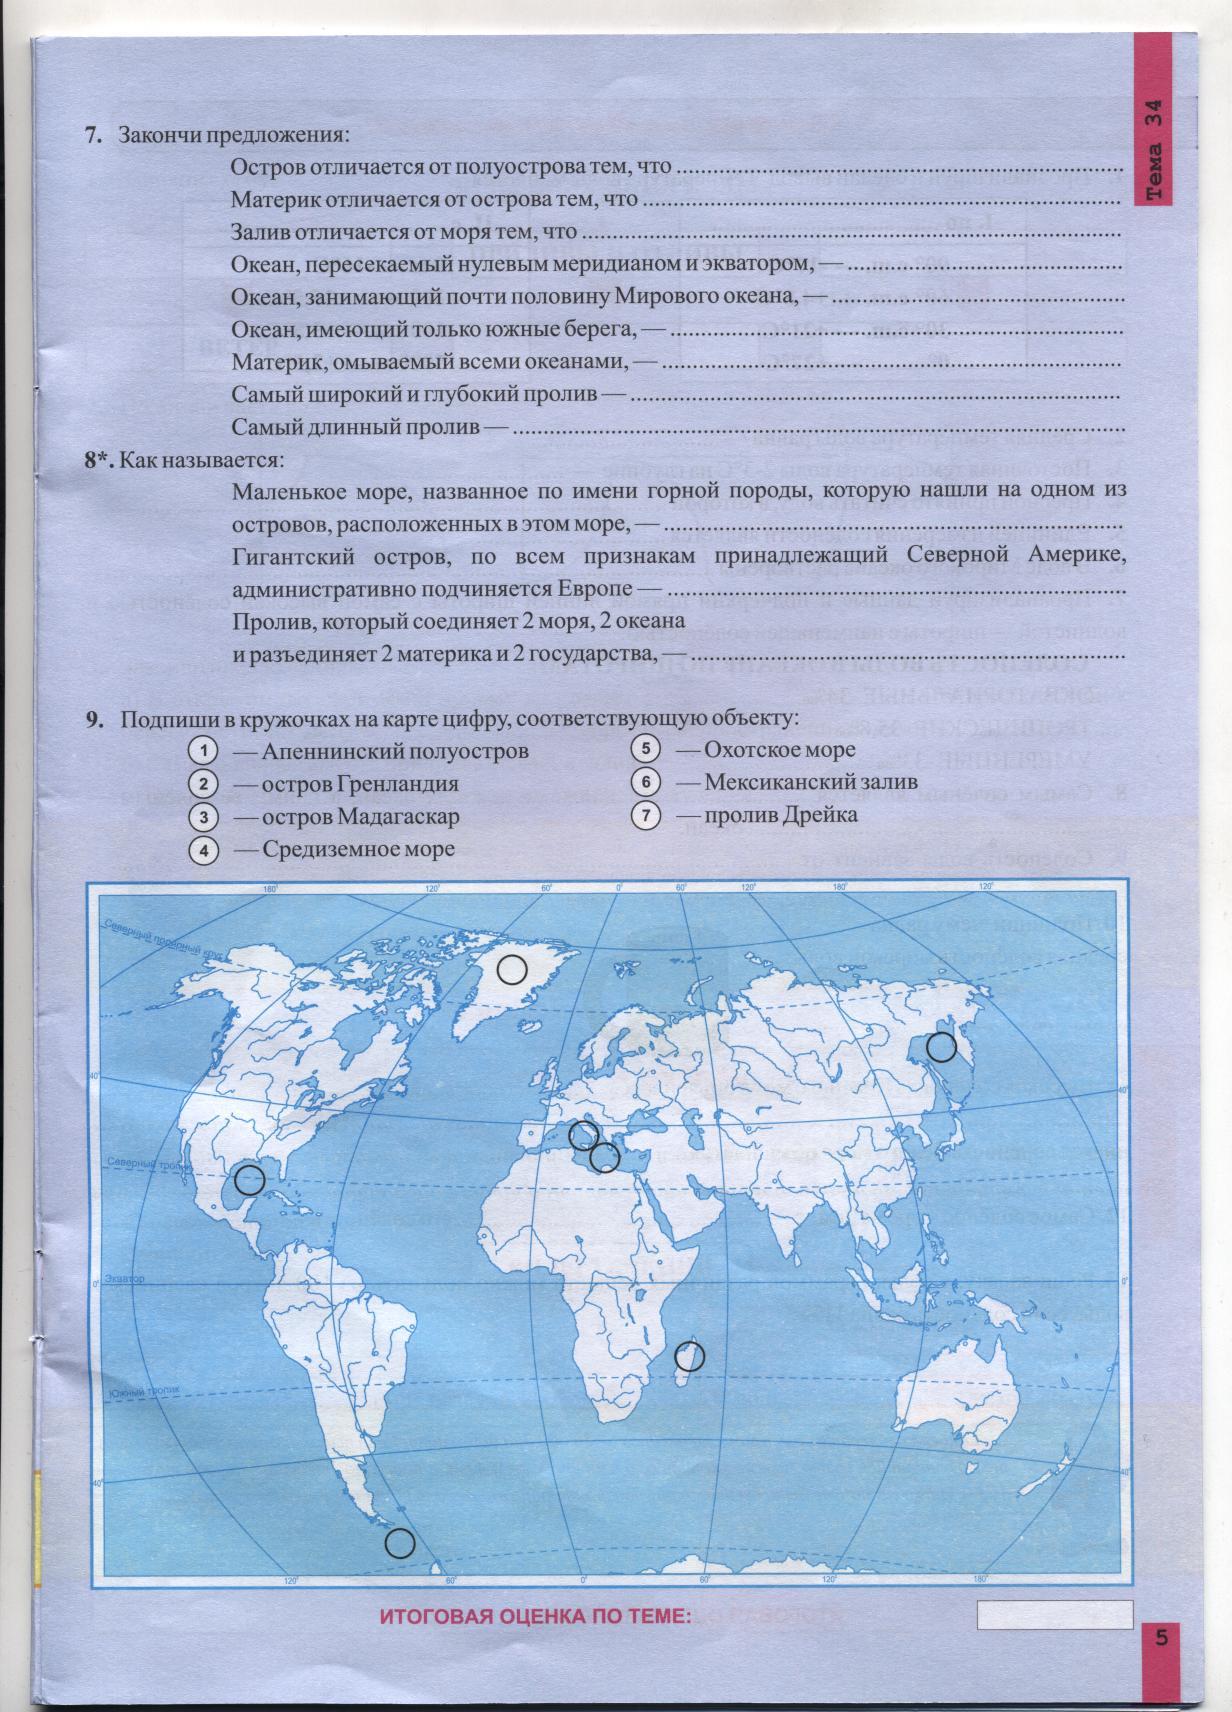 D:\с диска С\ДОКУМЕНТЫ\Роза Жумабековна\geography\6,2\5.jpg